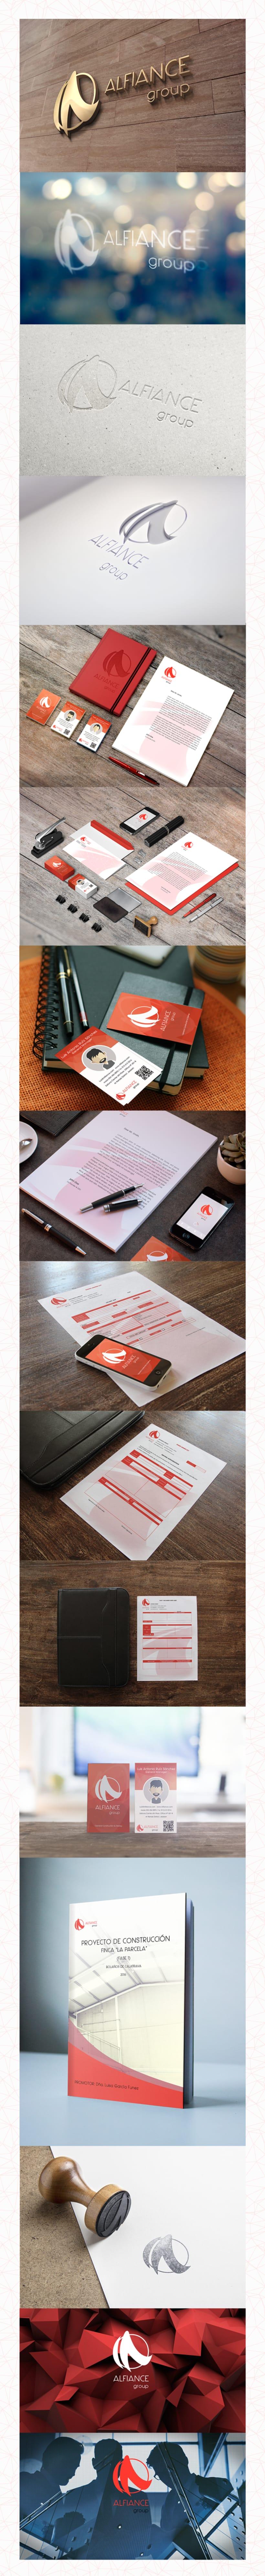 Alfiance Group - Branding -1